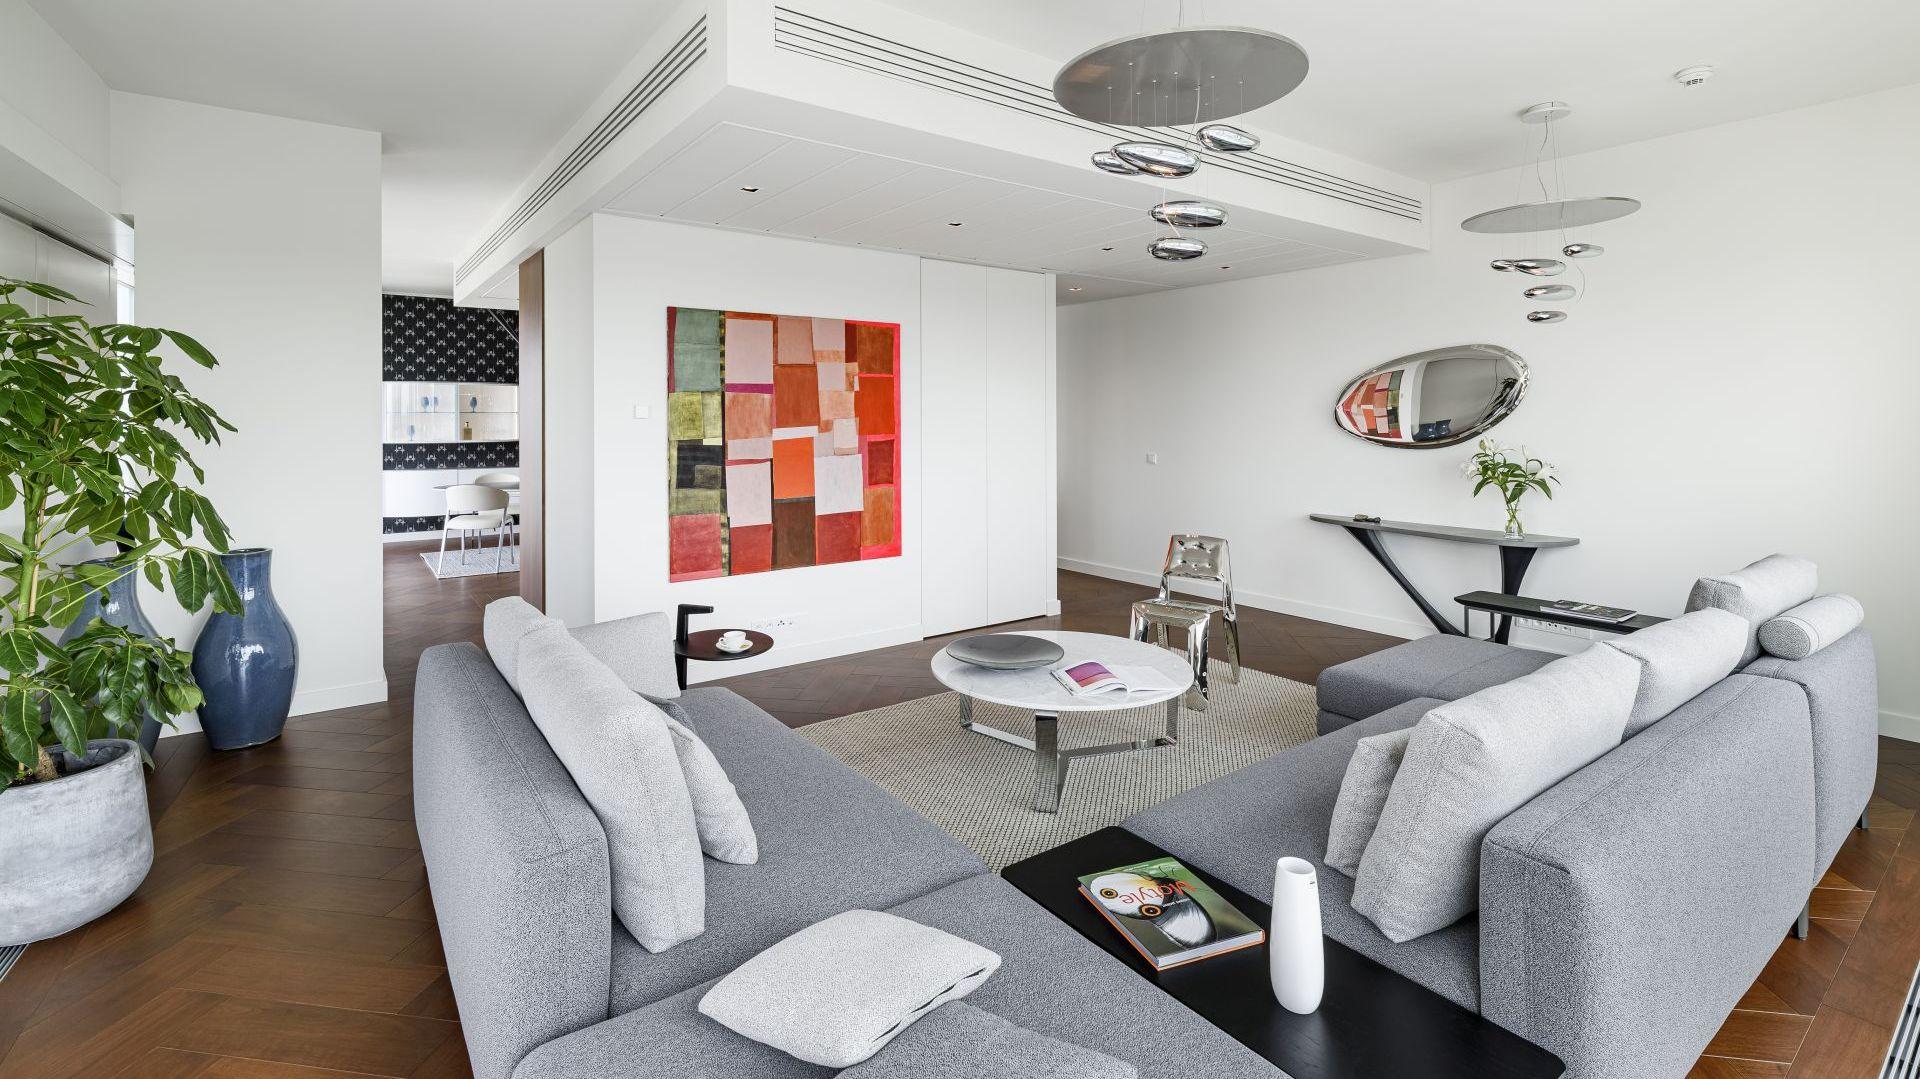 Zlota44_AKSONOMETRIA_apartament_293_vii2019-52.jpg